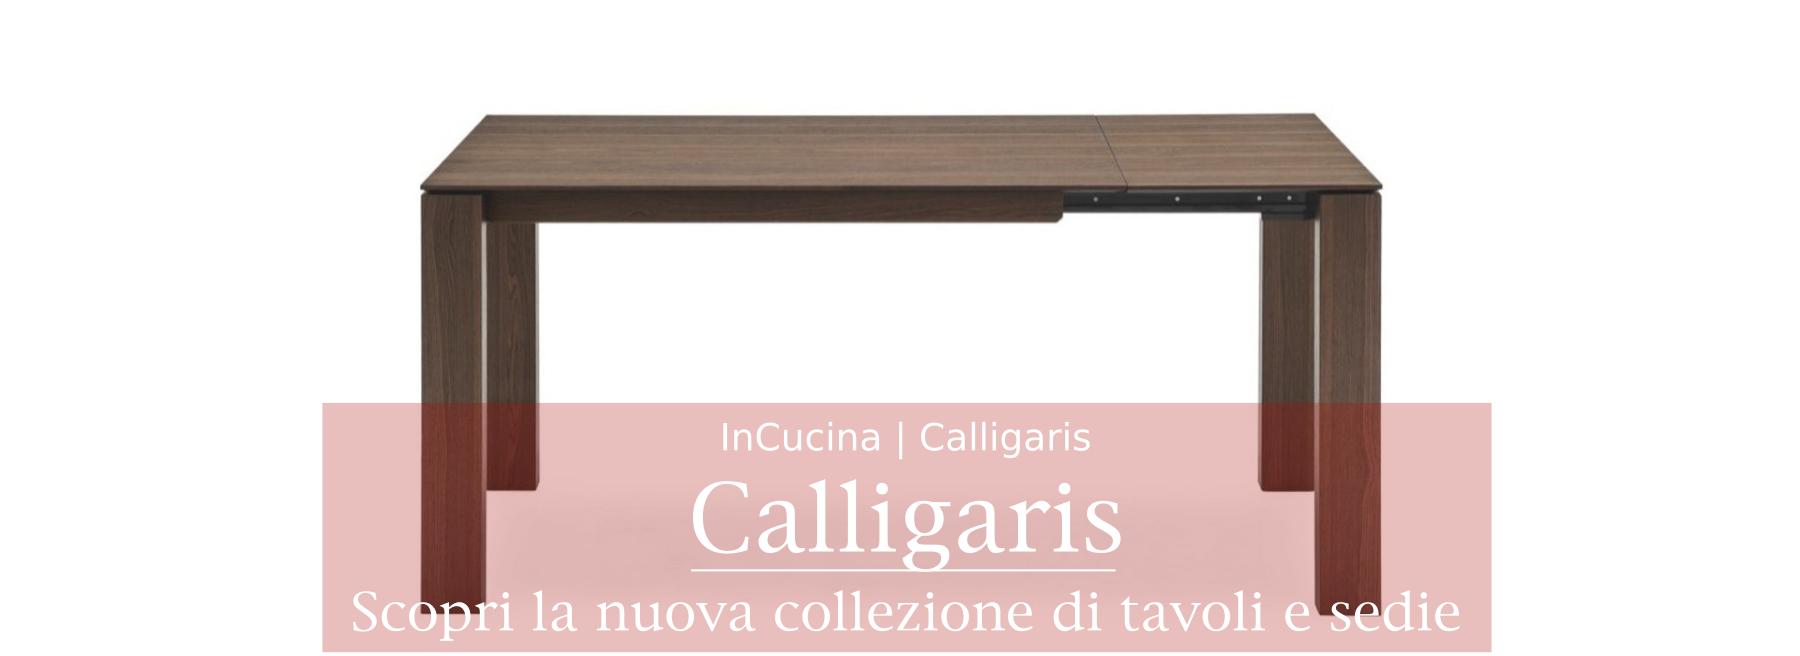 CALLIGARIS_SLIDER_1920_700